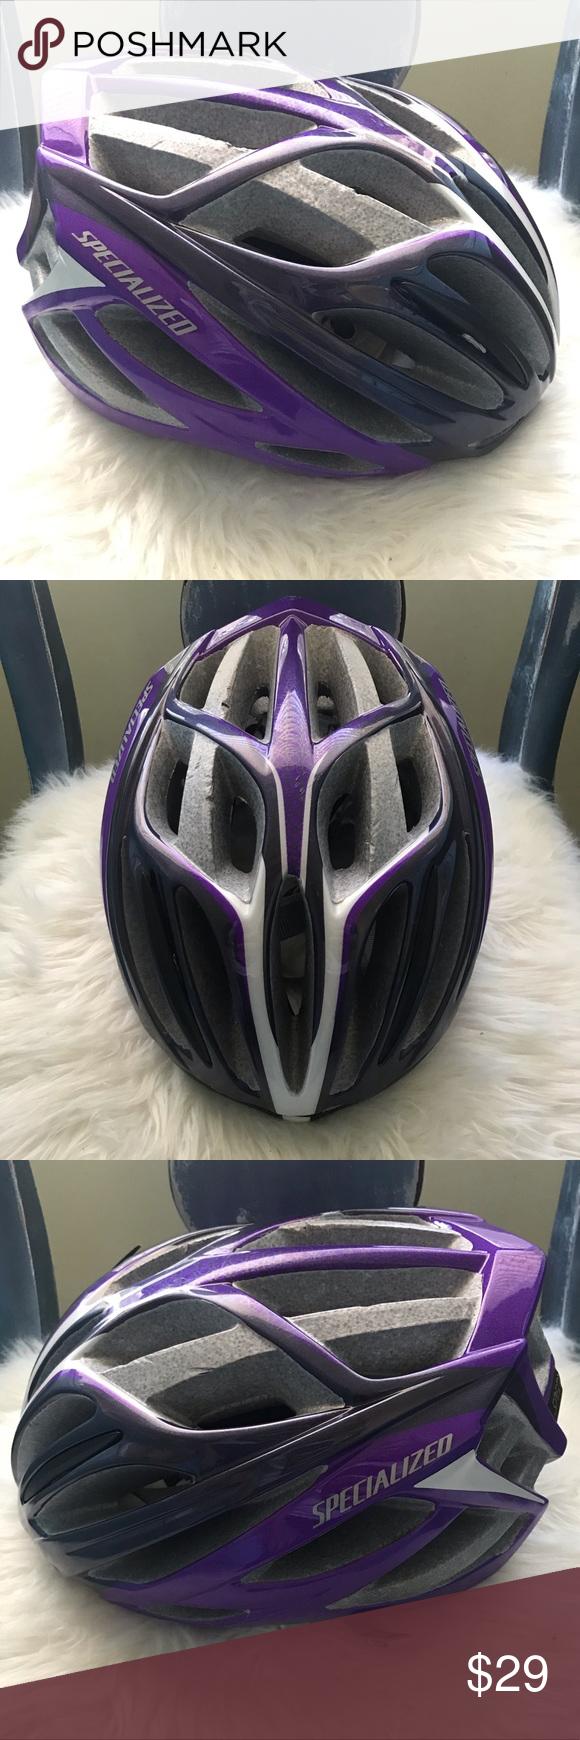 Specialized Aspire Women S Helmet Small 51 56cm In 2020 Things To Sell Women Helmet